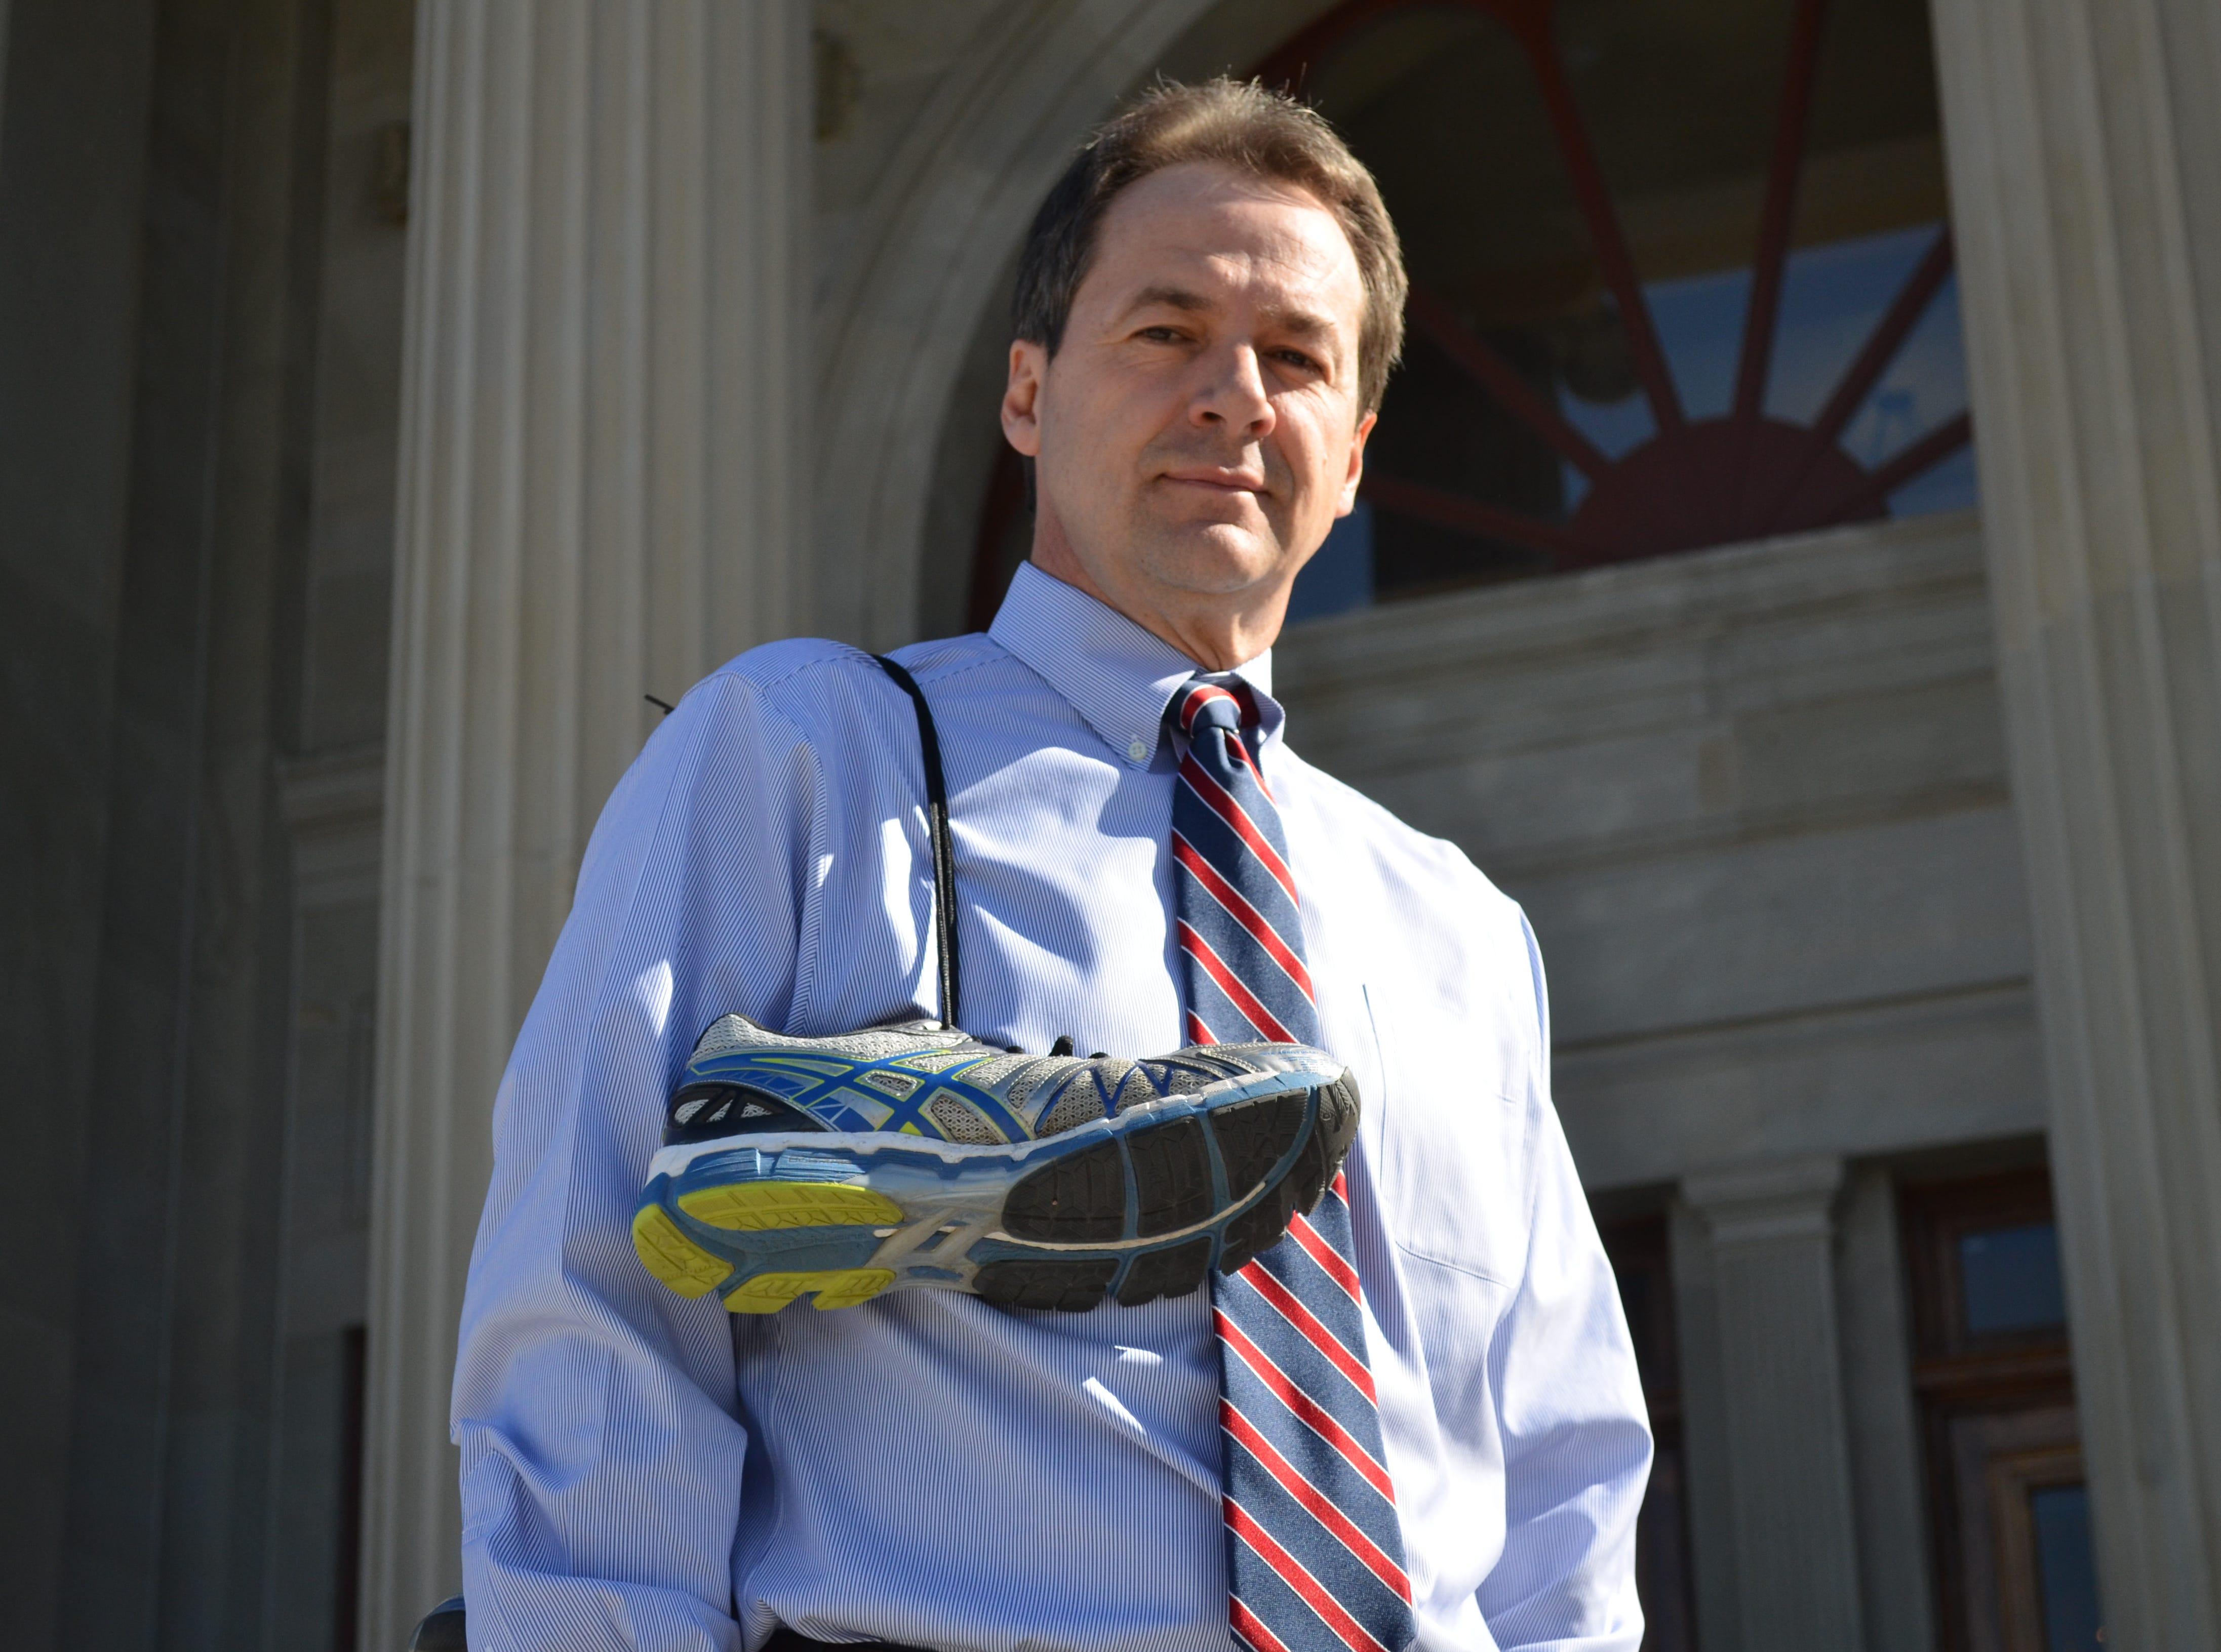 Gov. Steve Bullock prepares for Boston Marathon COURTESY PHOTO